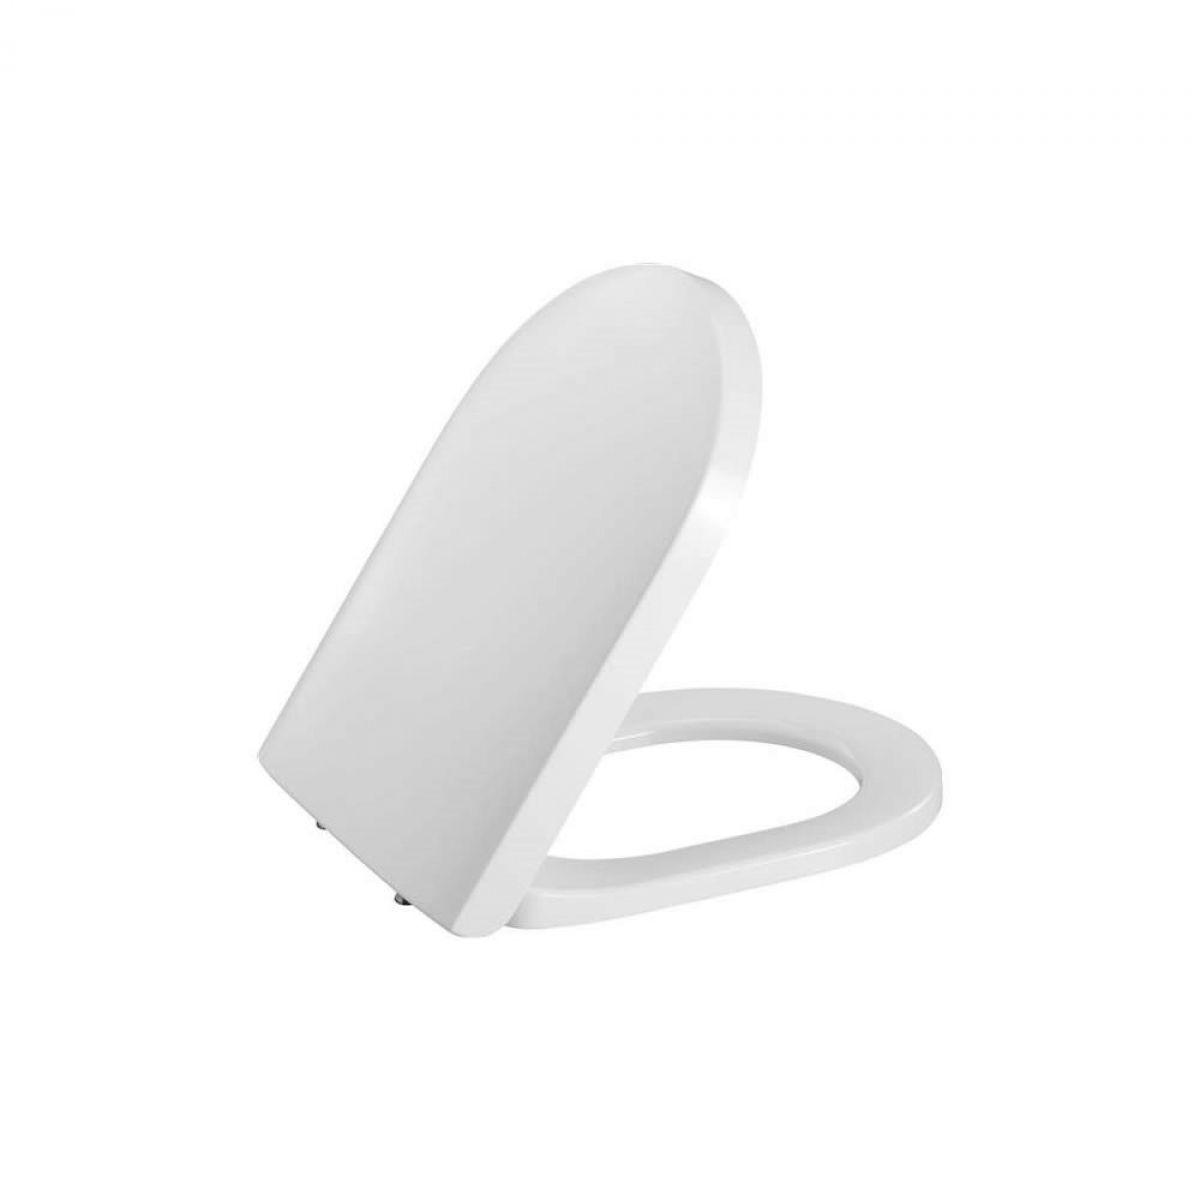 Pressalit Tivoli-D Soft Closing Toilet Seat : UK Bathrooms